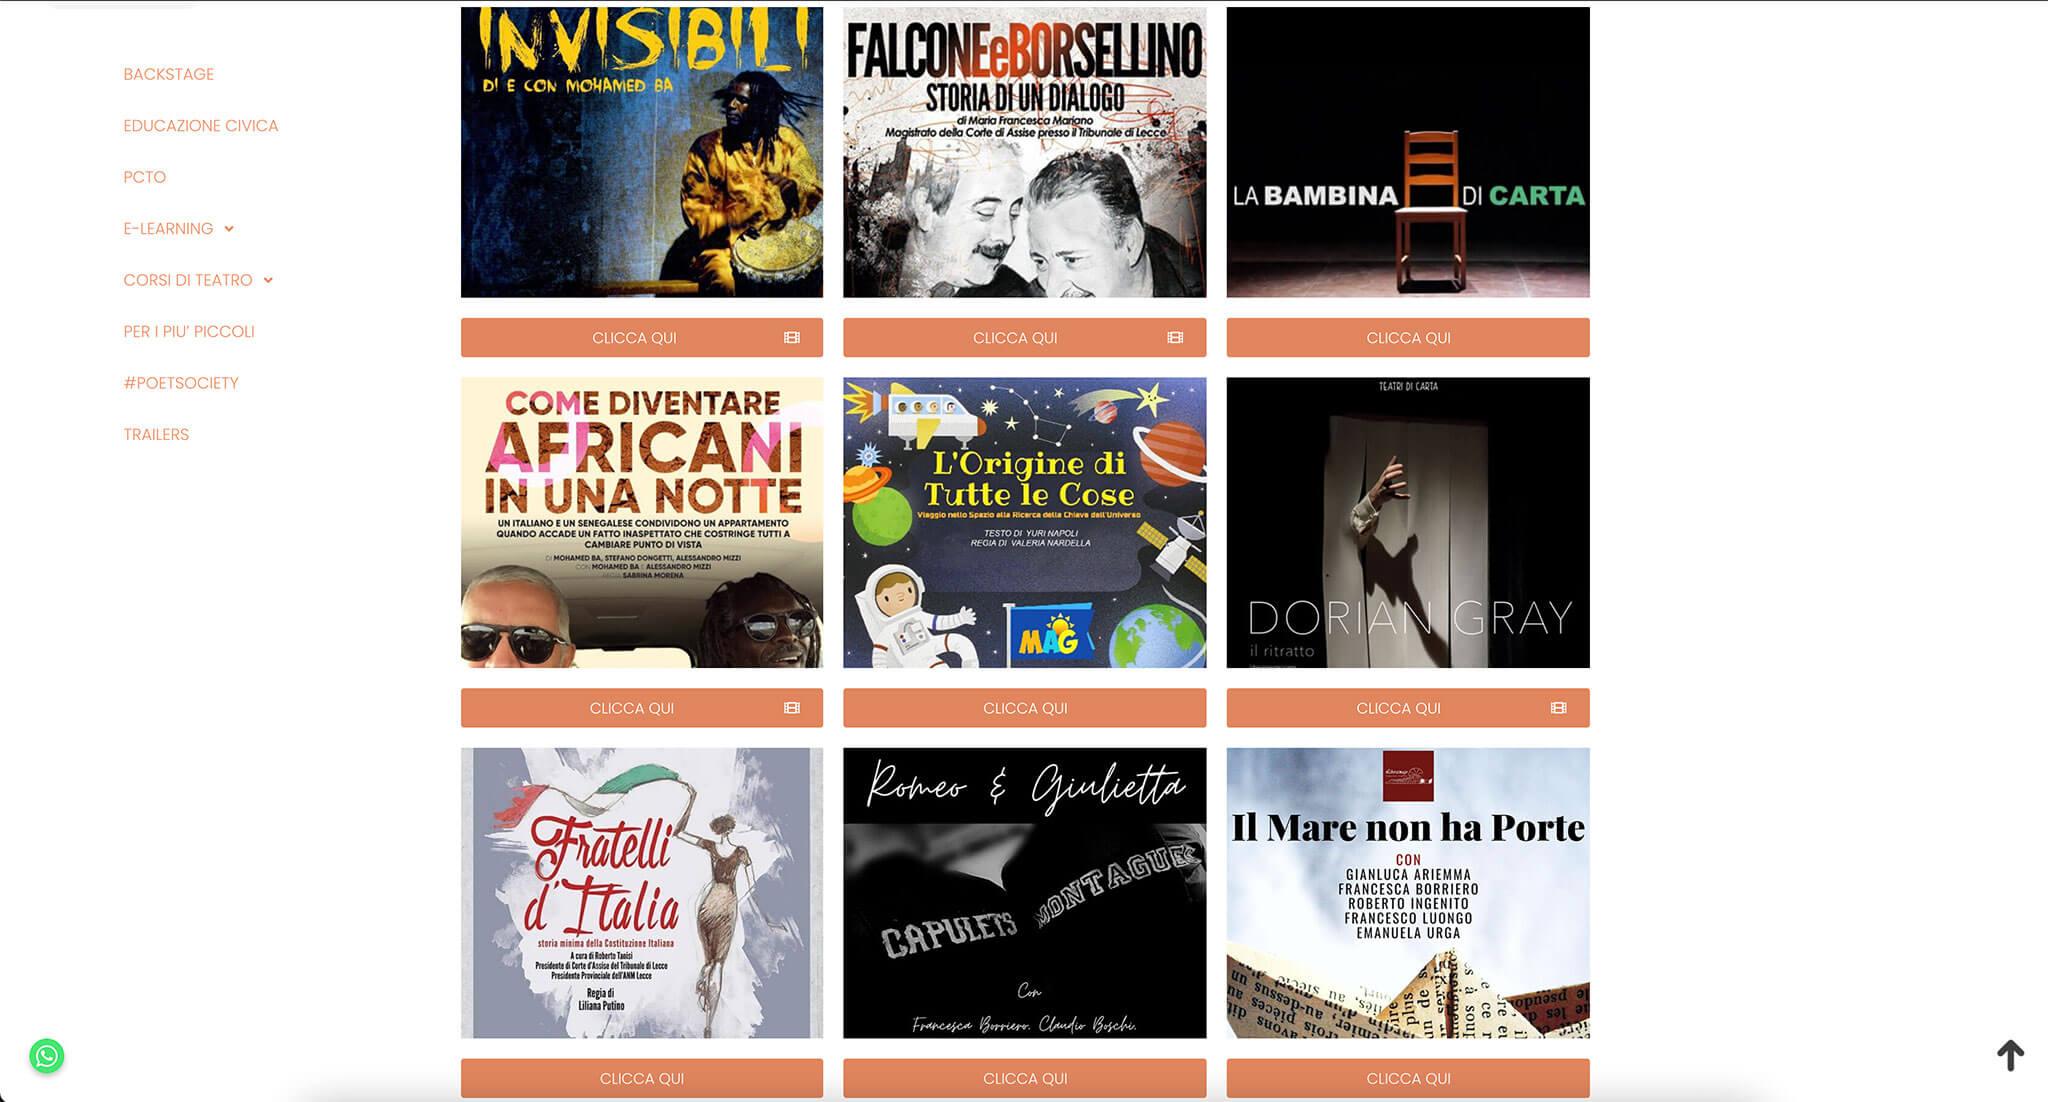 Erasmus Theatre Website Overview